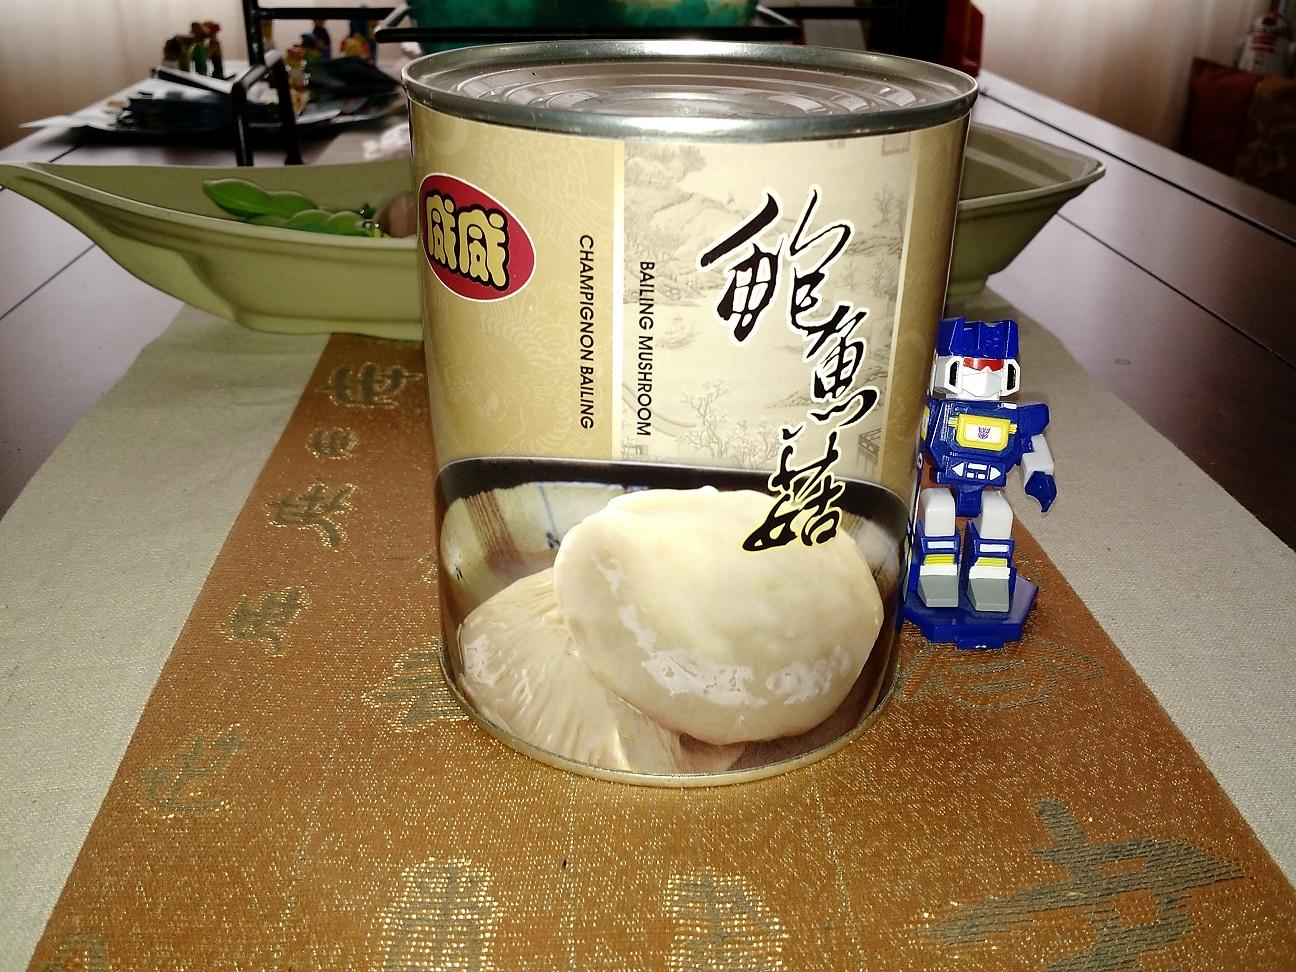 Fongpay's Universe: Weekend Report: Bailing Mushrooms1296 x 972 jpeg 679kB